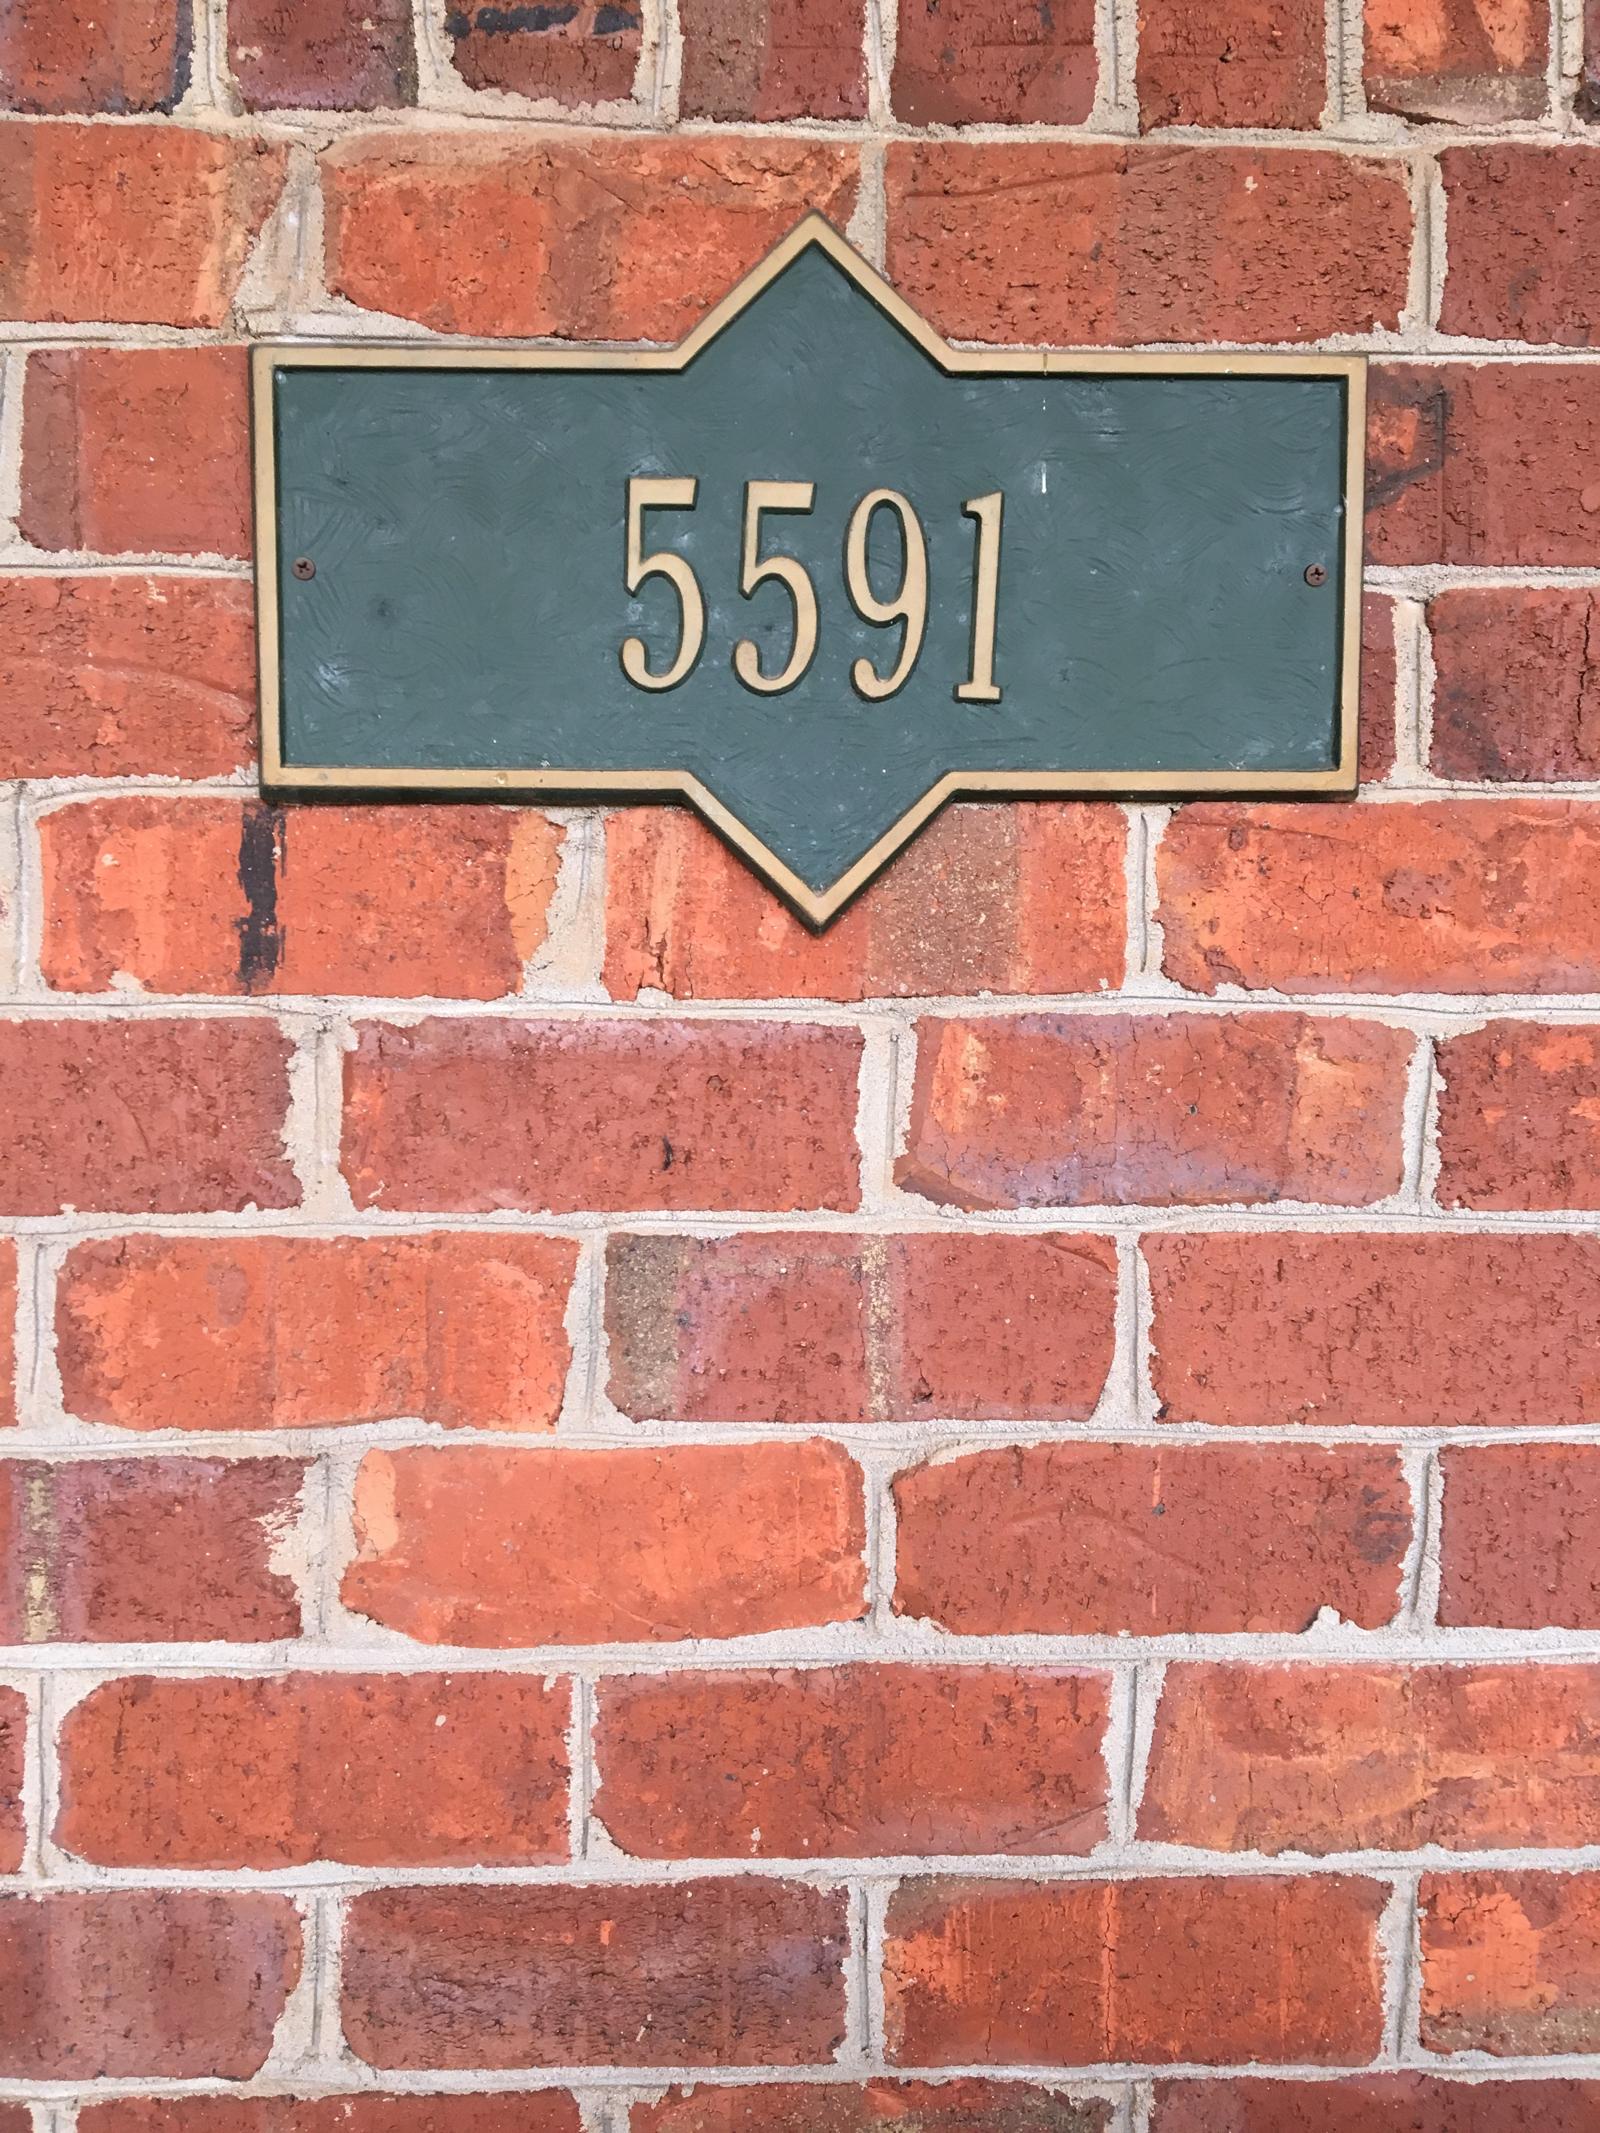 selecting-brick-involves-driving-around